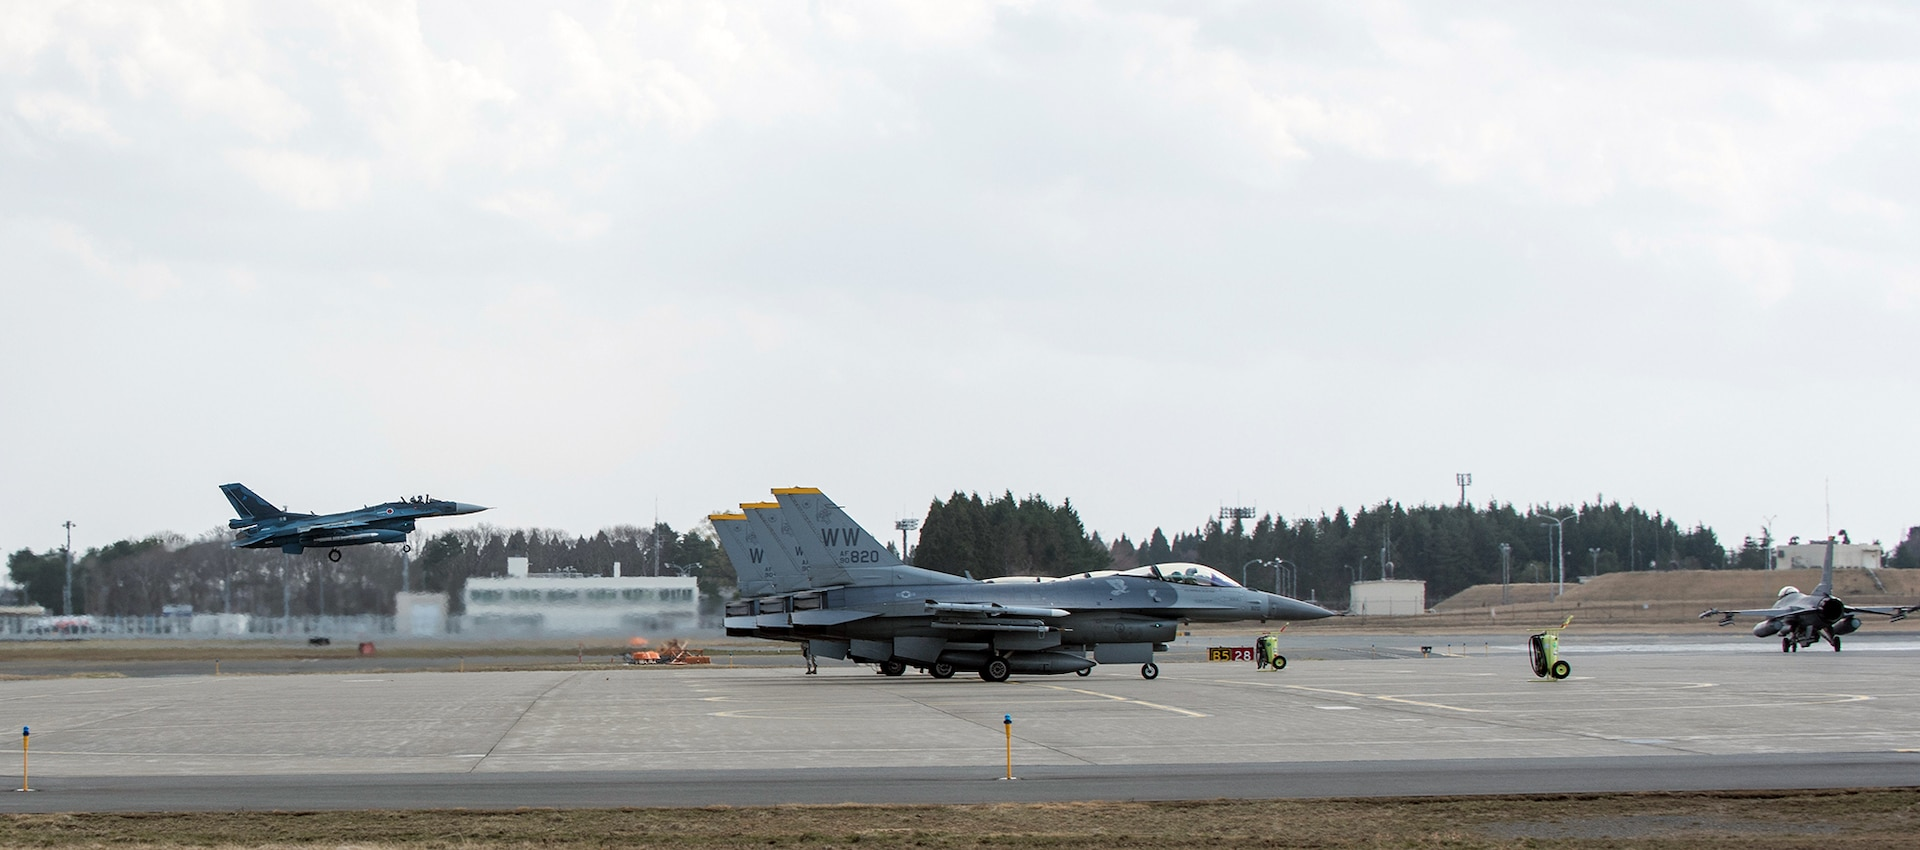 US, Japan bilateral bond shown through dissimilar air combat tactics operations